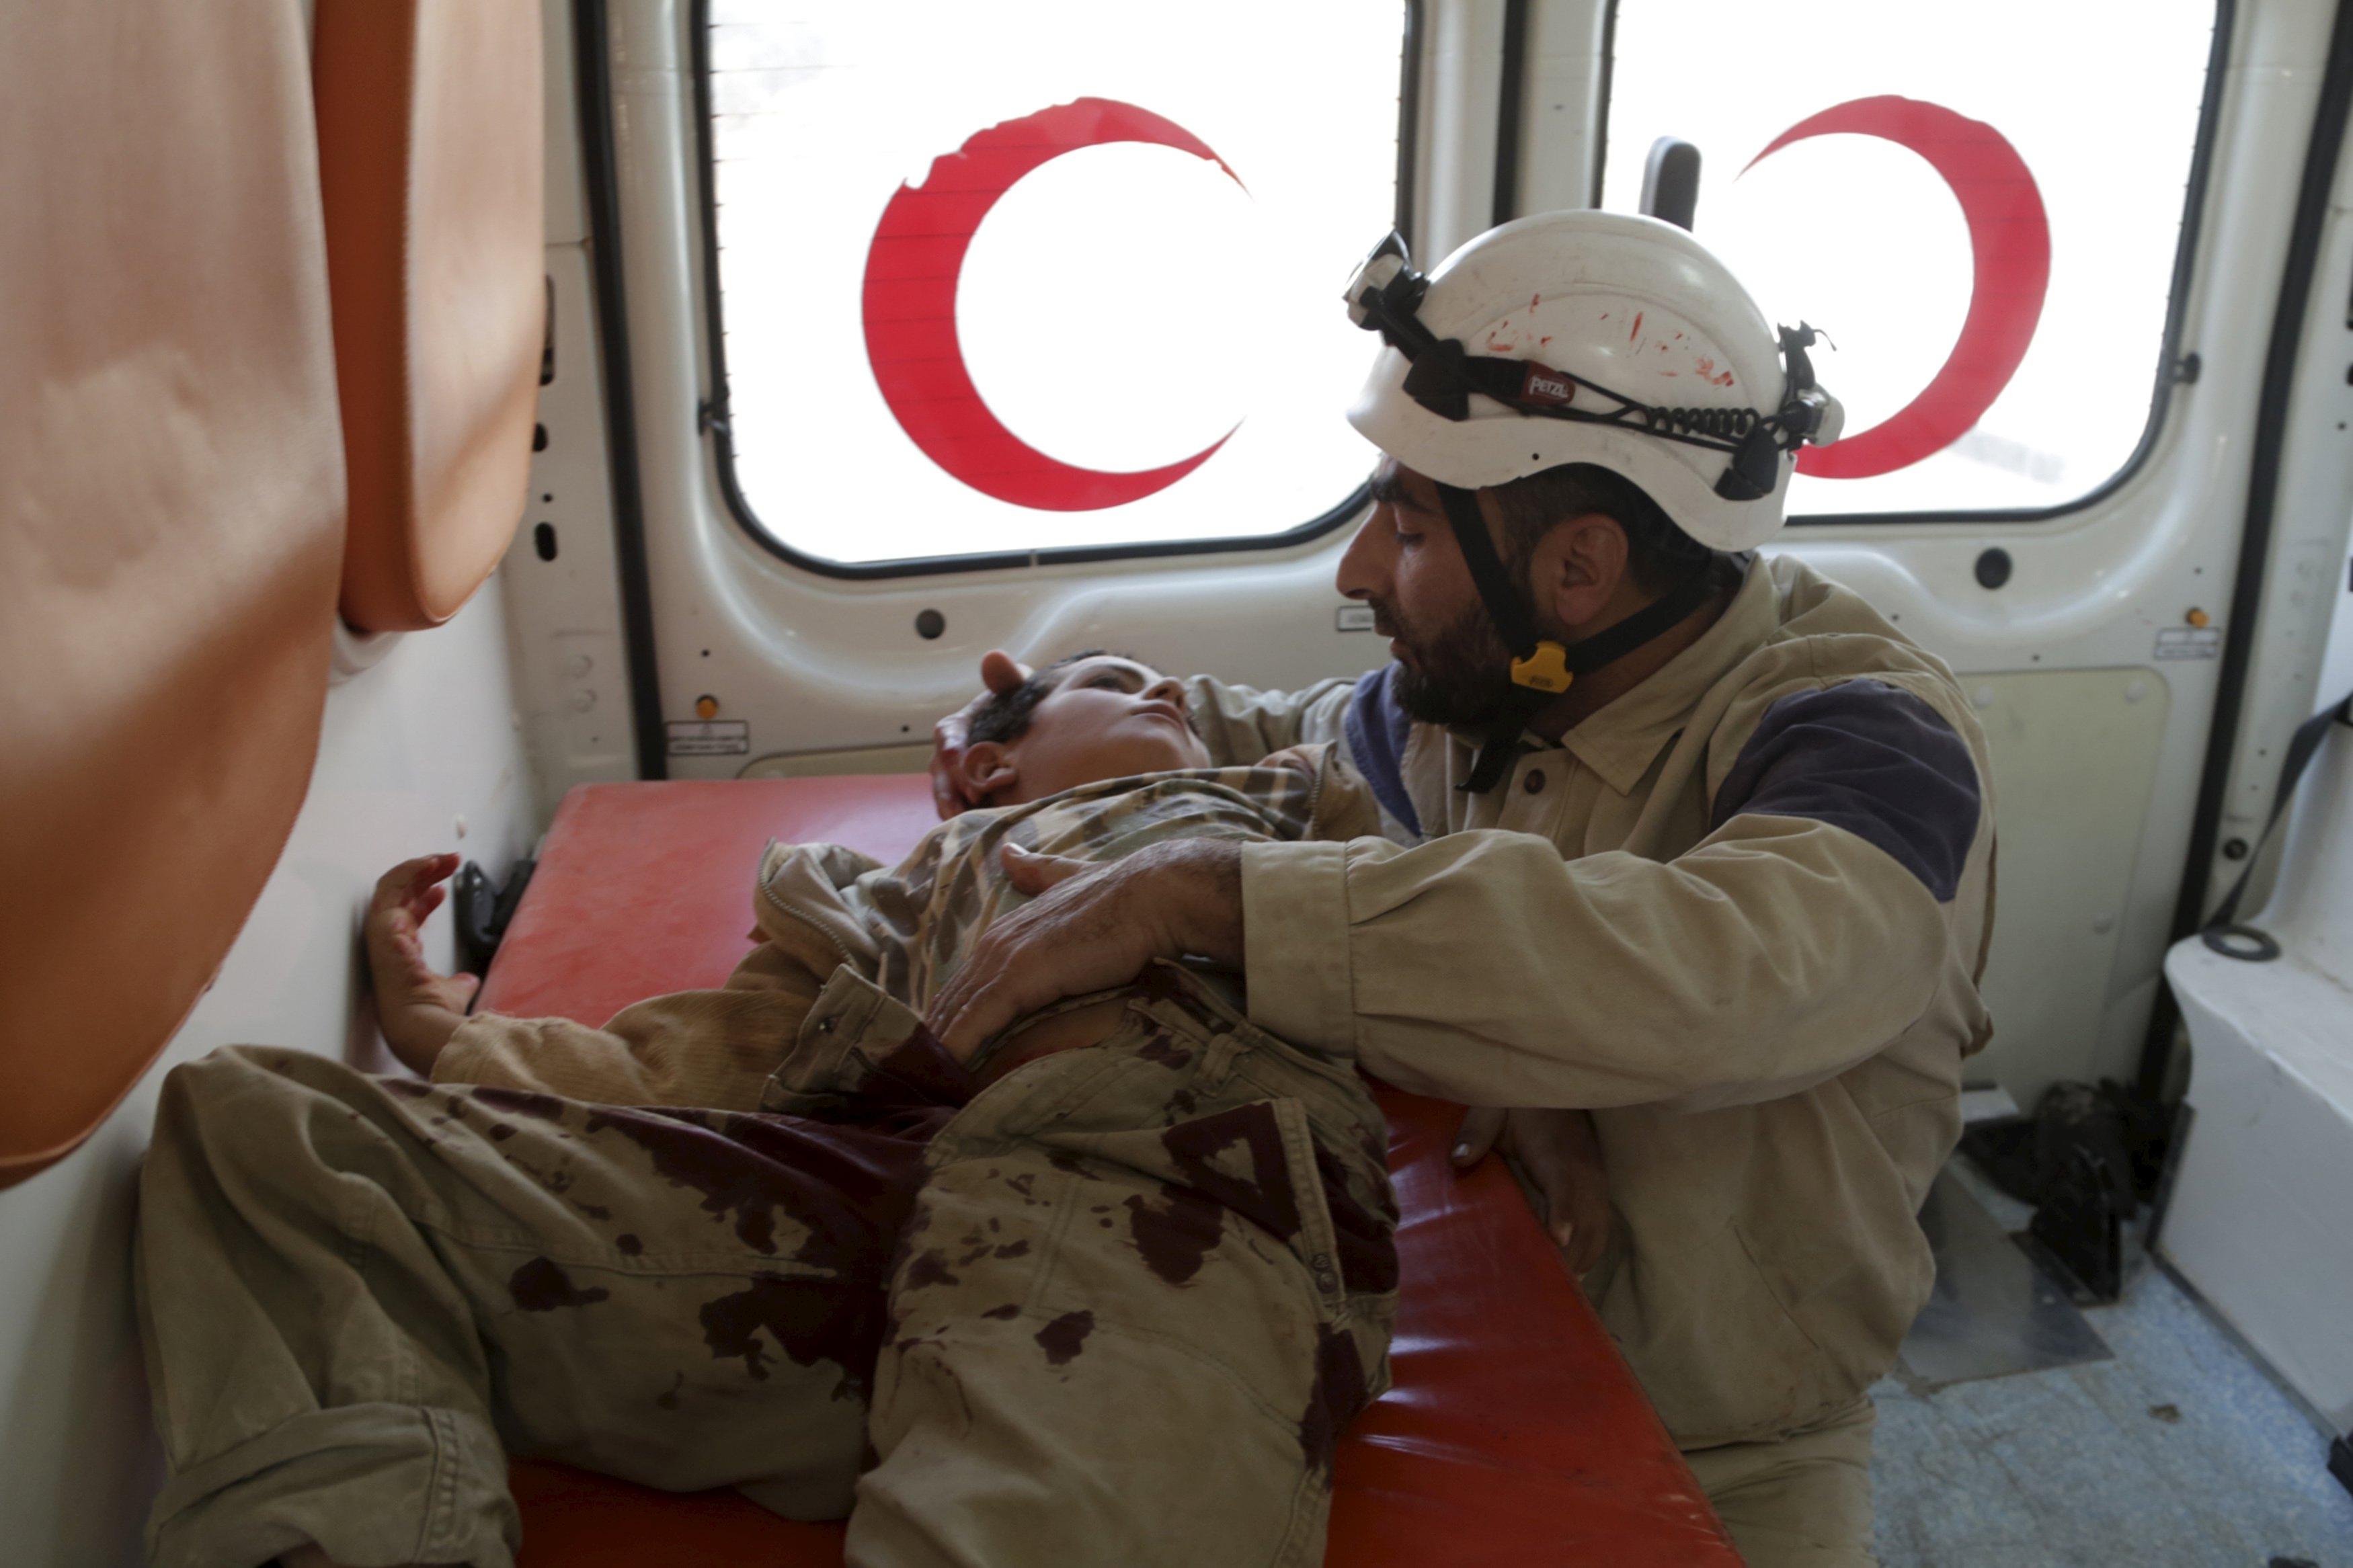 Anggota pertahanan sipil merawat bocah lelaki yang terluka di dalam sebuah ambulans setelah Rusia menjatuhkan gugus bom, menurut aktivis di Maaret al-Naaman, provinsi Idlib, Suriah, Rabu (7/10). ANTARA FOTO/REUTERS/Khalil Ashawi.